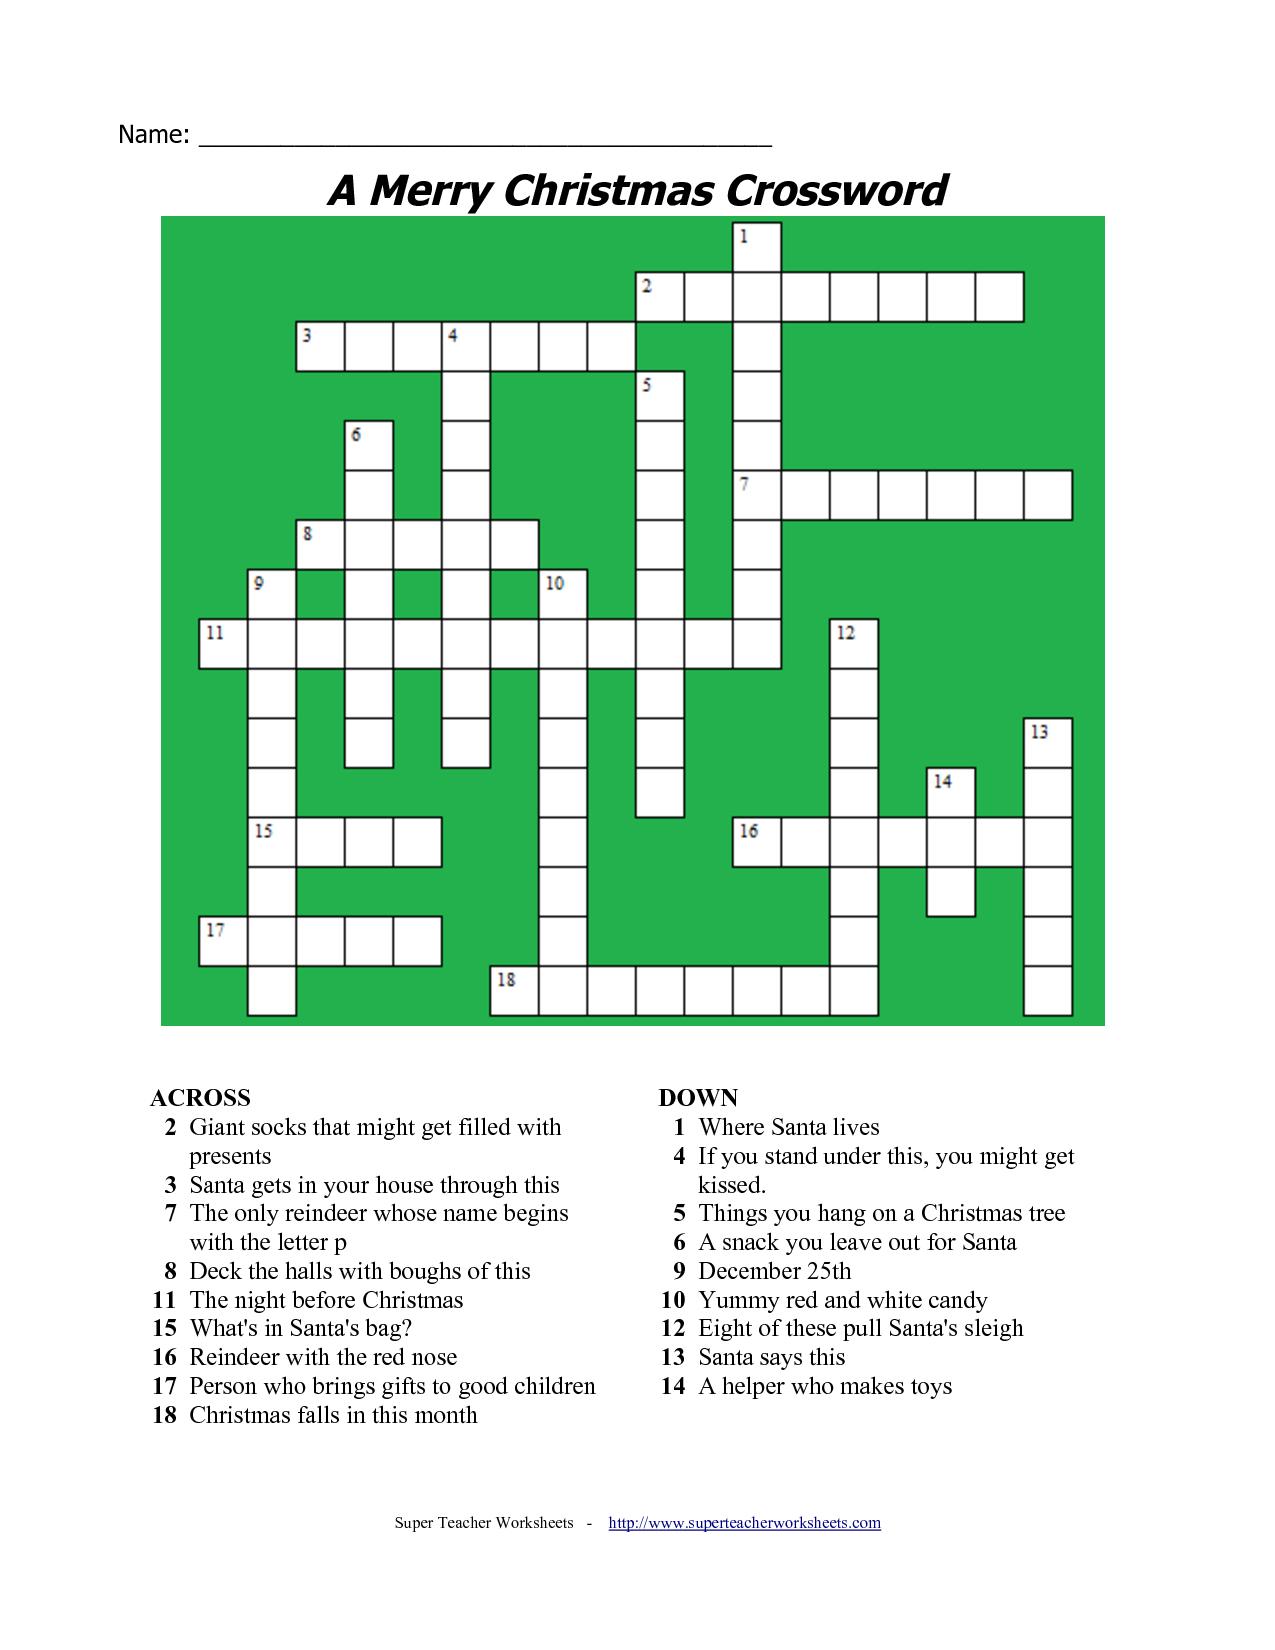 20 Fun Printable Christmas Crossword Puzzles | Kittybabylove - Printable Crossword Christmas